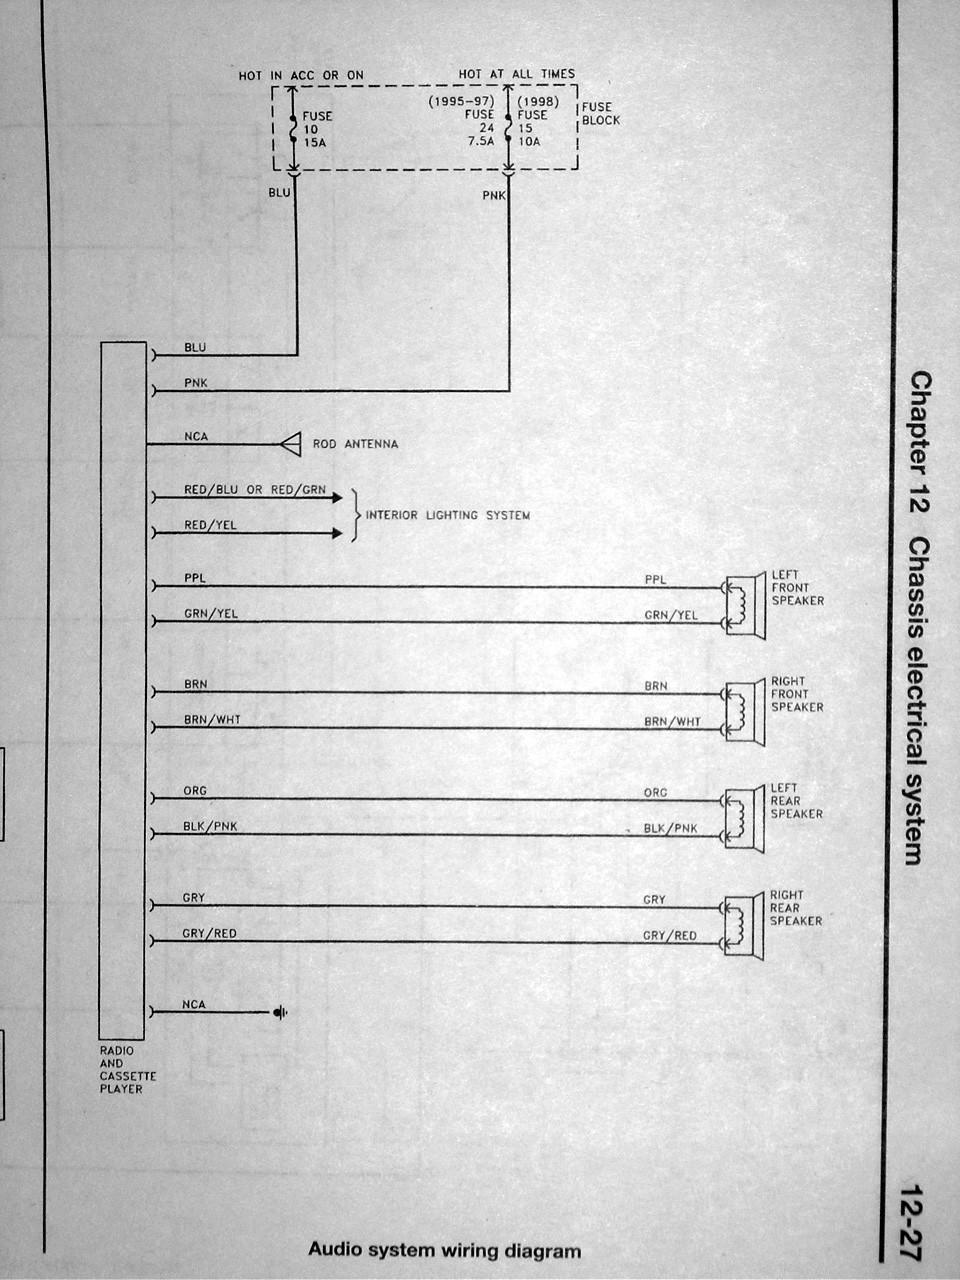 2001 Nissan Frontier Speaker Wiring Diagram